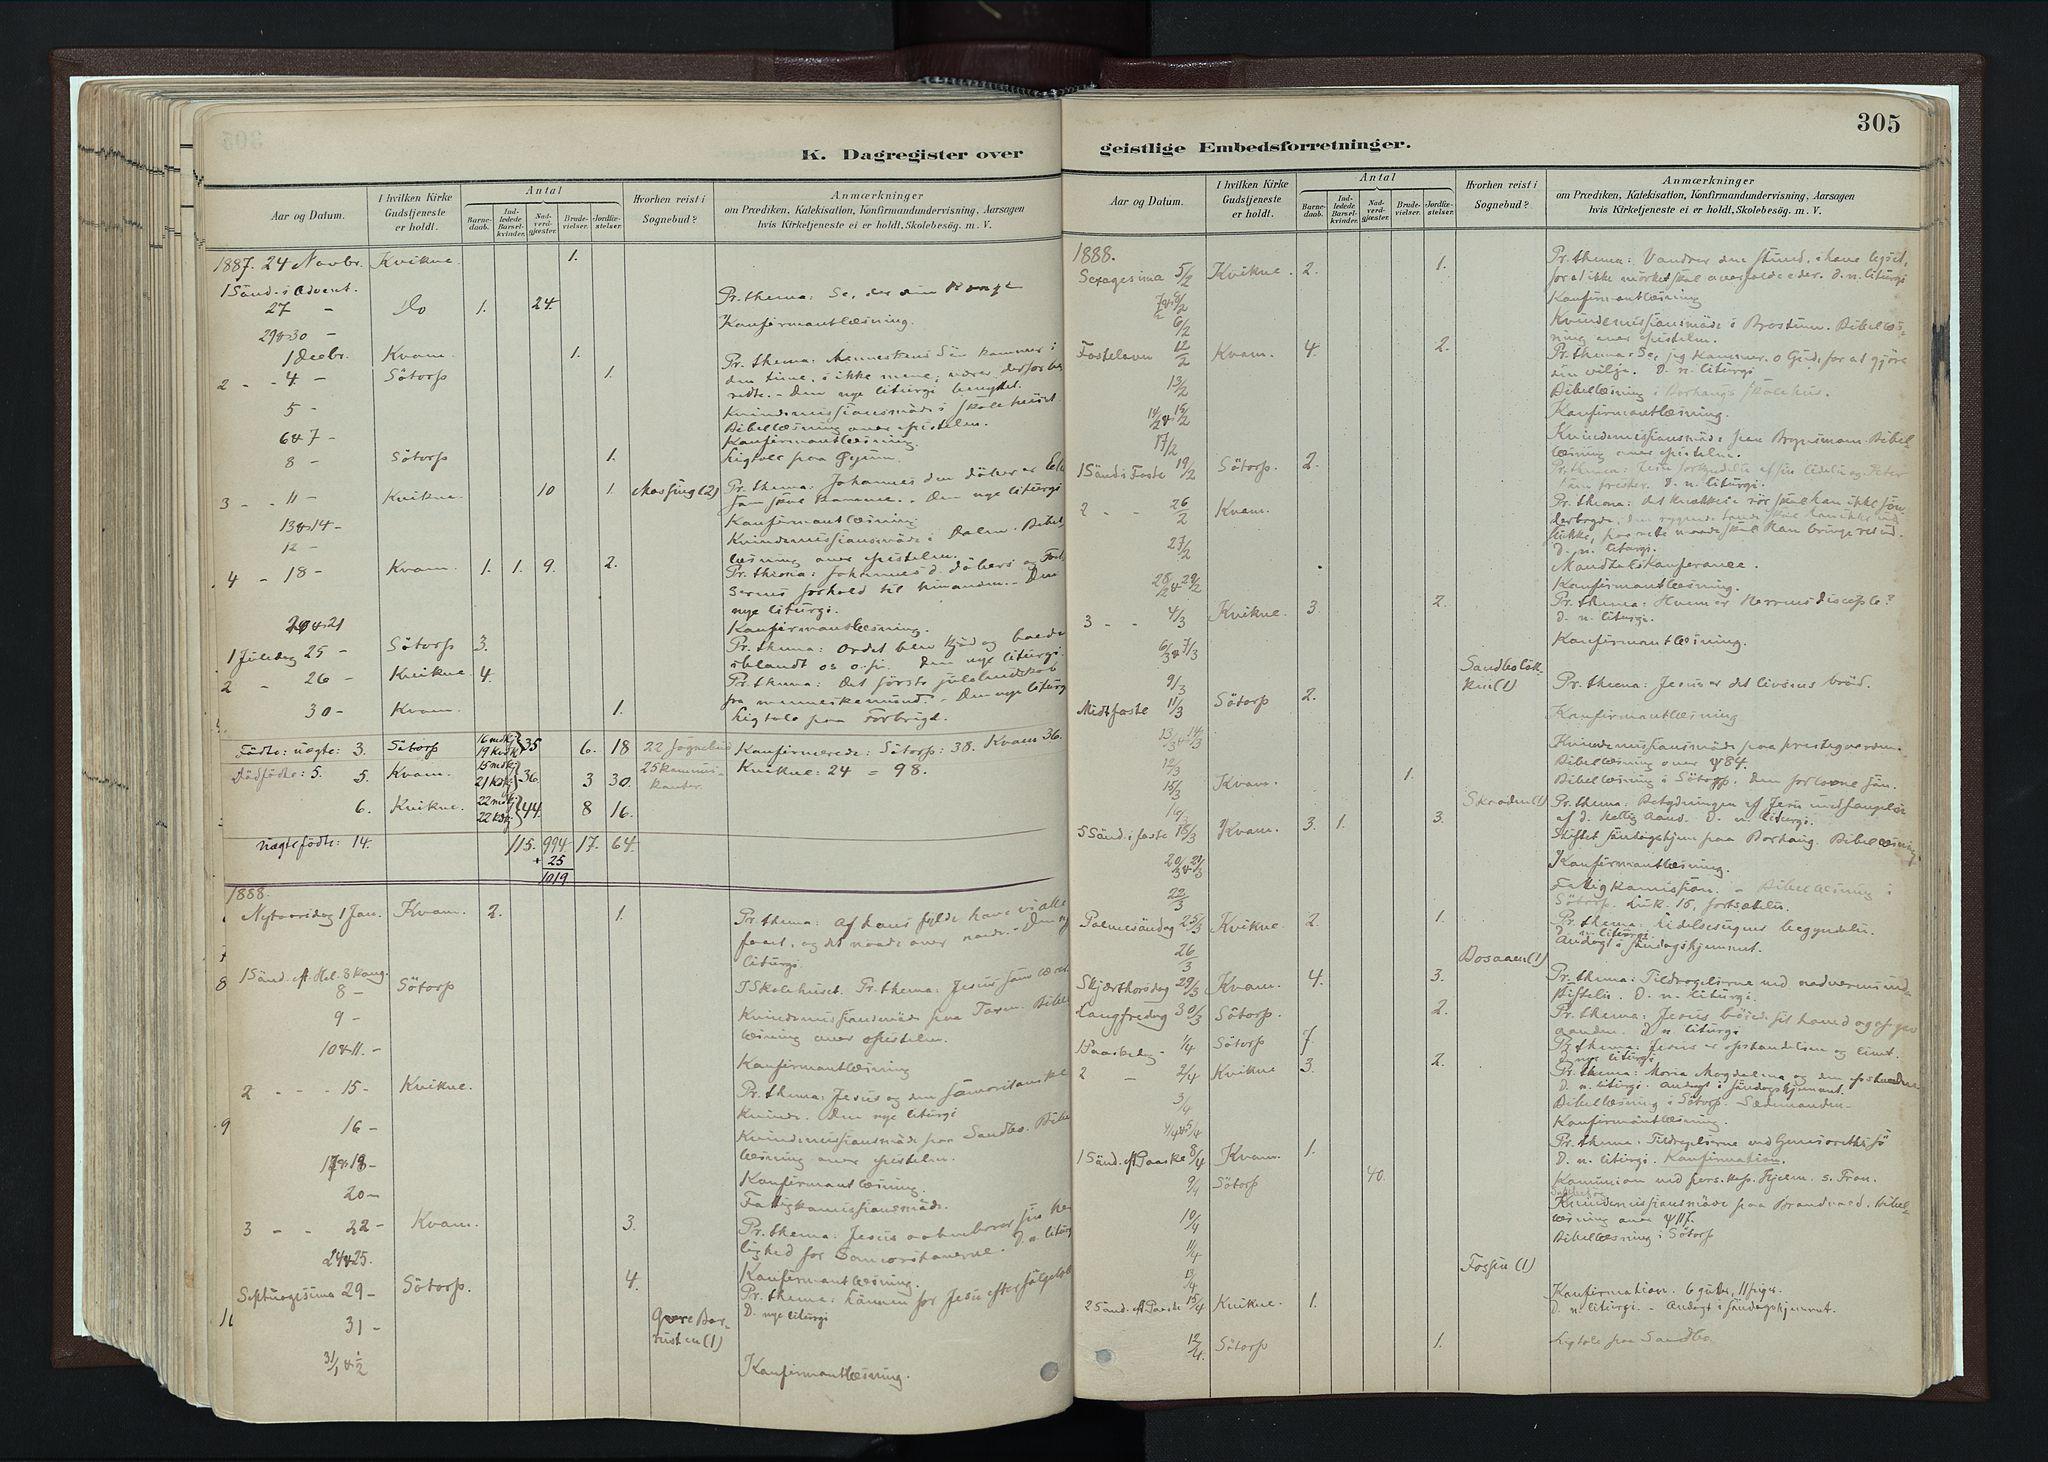 SAH, Nord-Fron prestekontor, Ministerialbok nr. 4, 1884-1914, s. 305